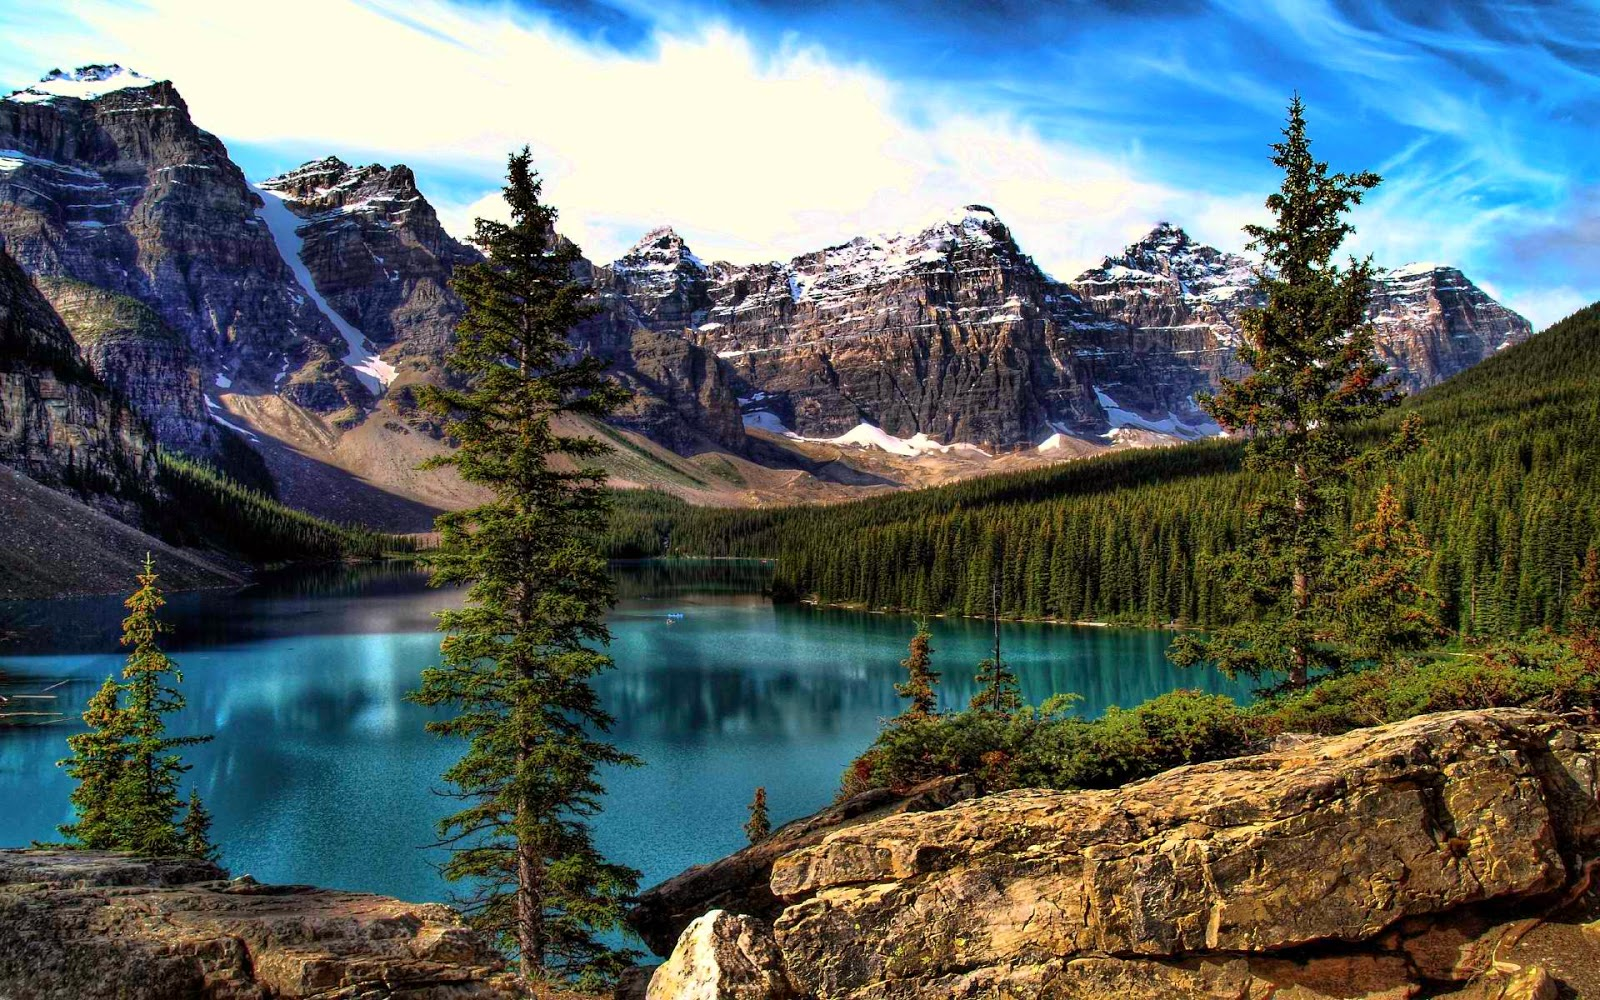 Moriane Lake, Banff National Park, Alberta, Canada